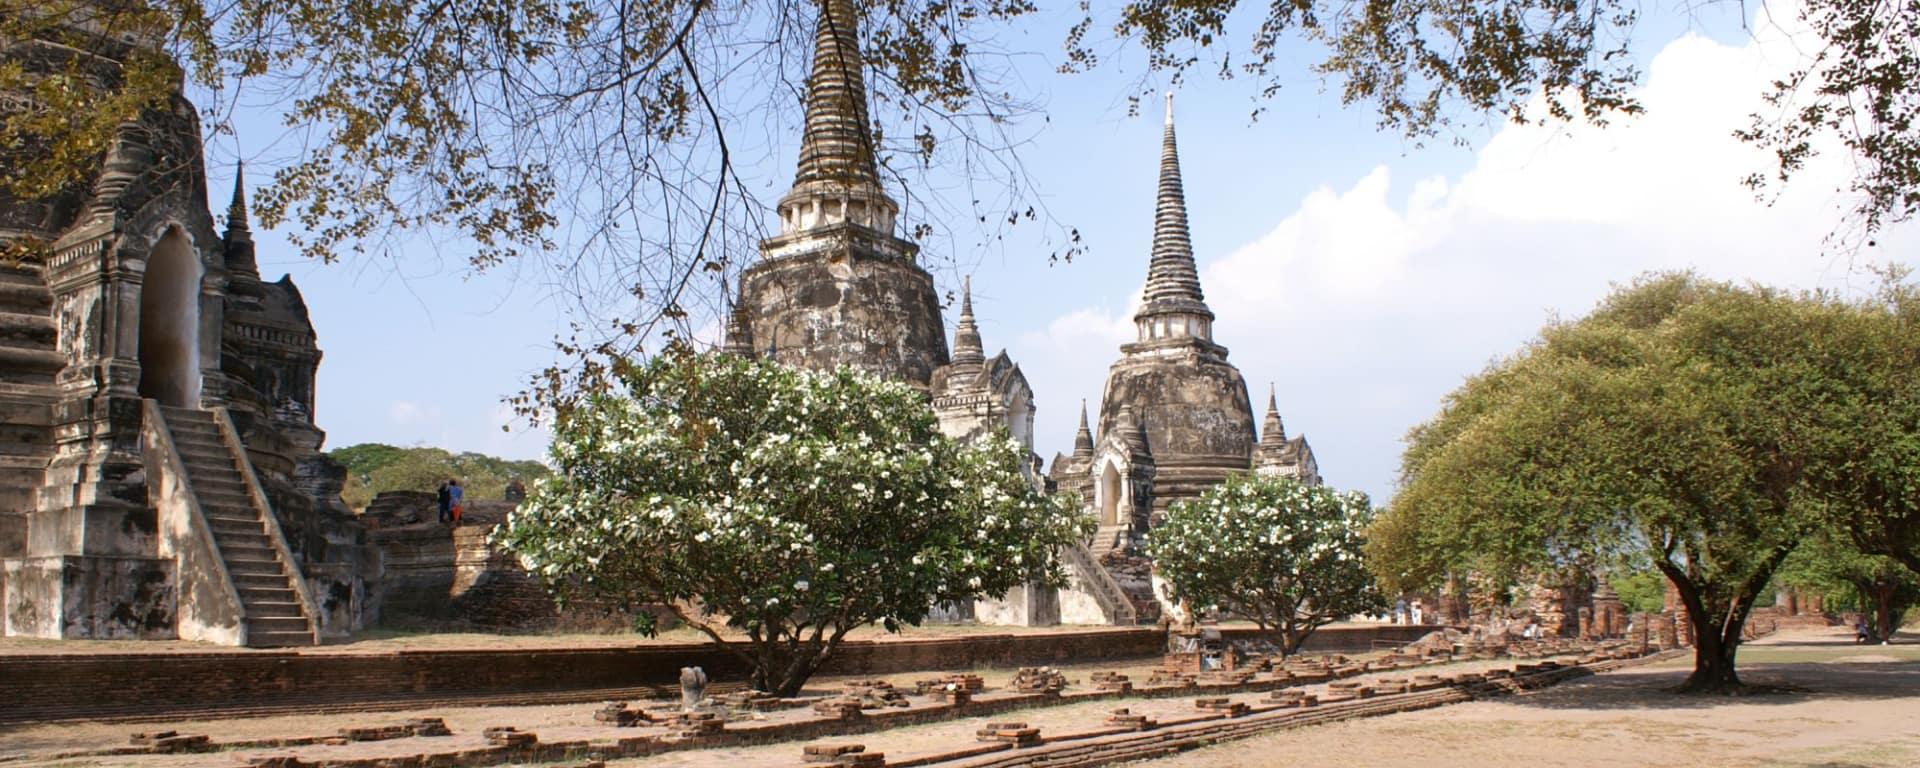 Natur & Kultur rund um Bangkok: Ayutthaya: